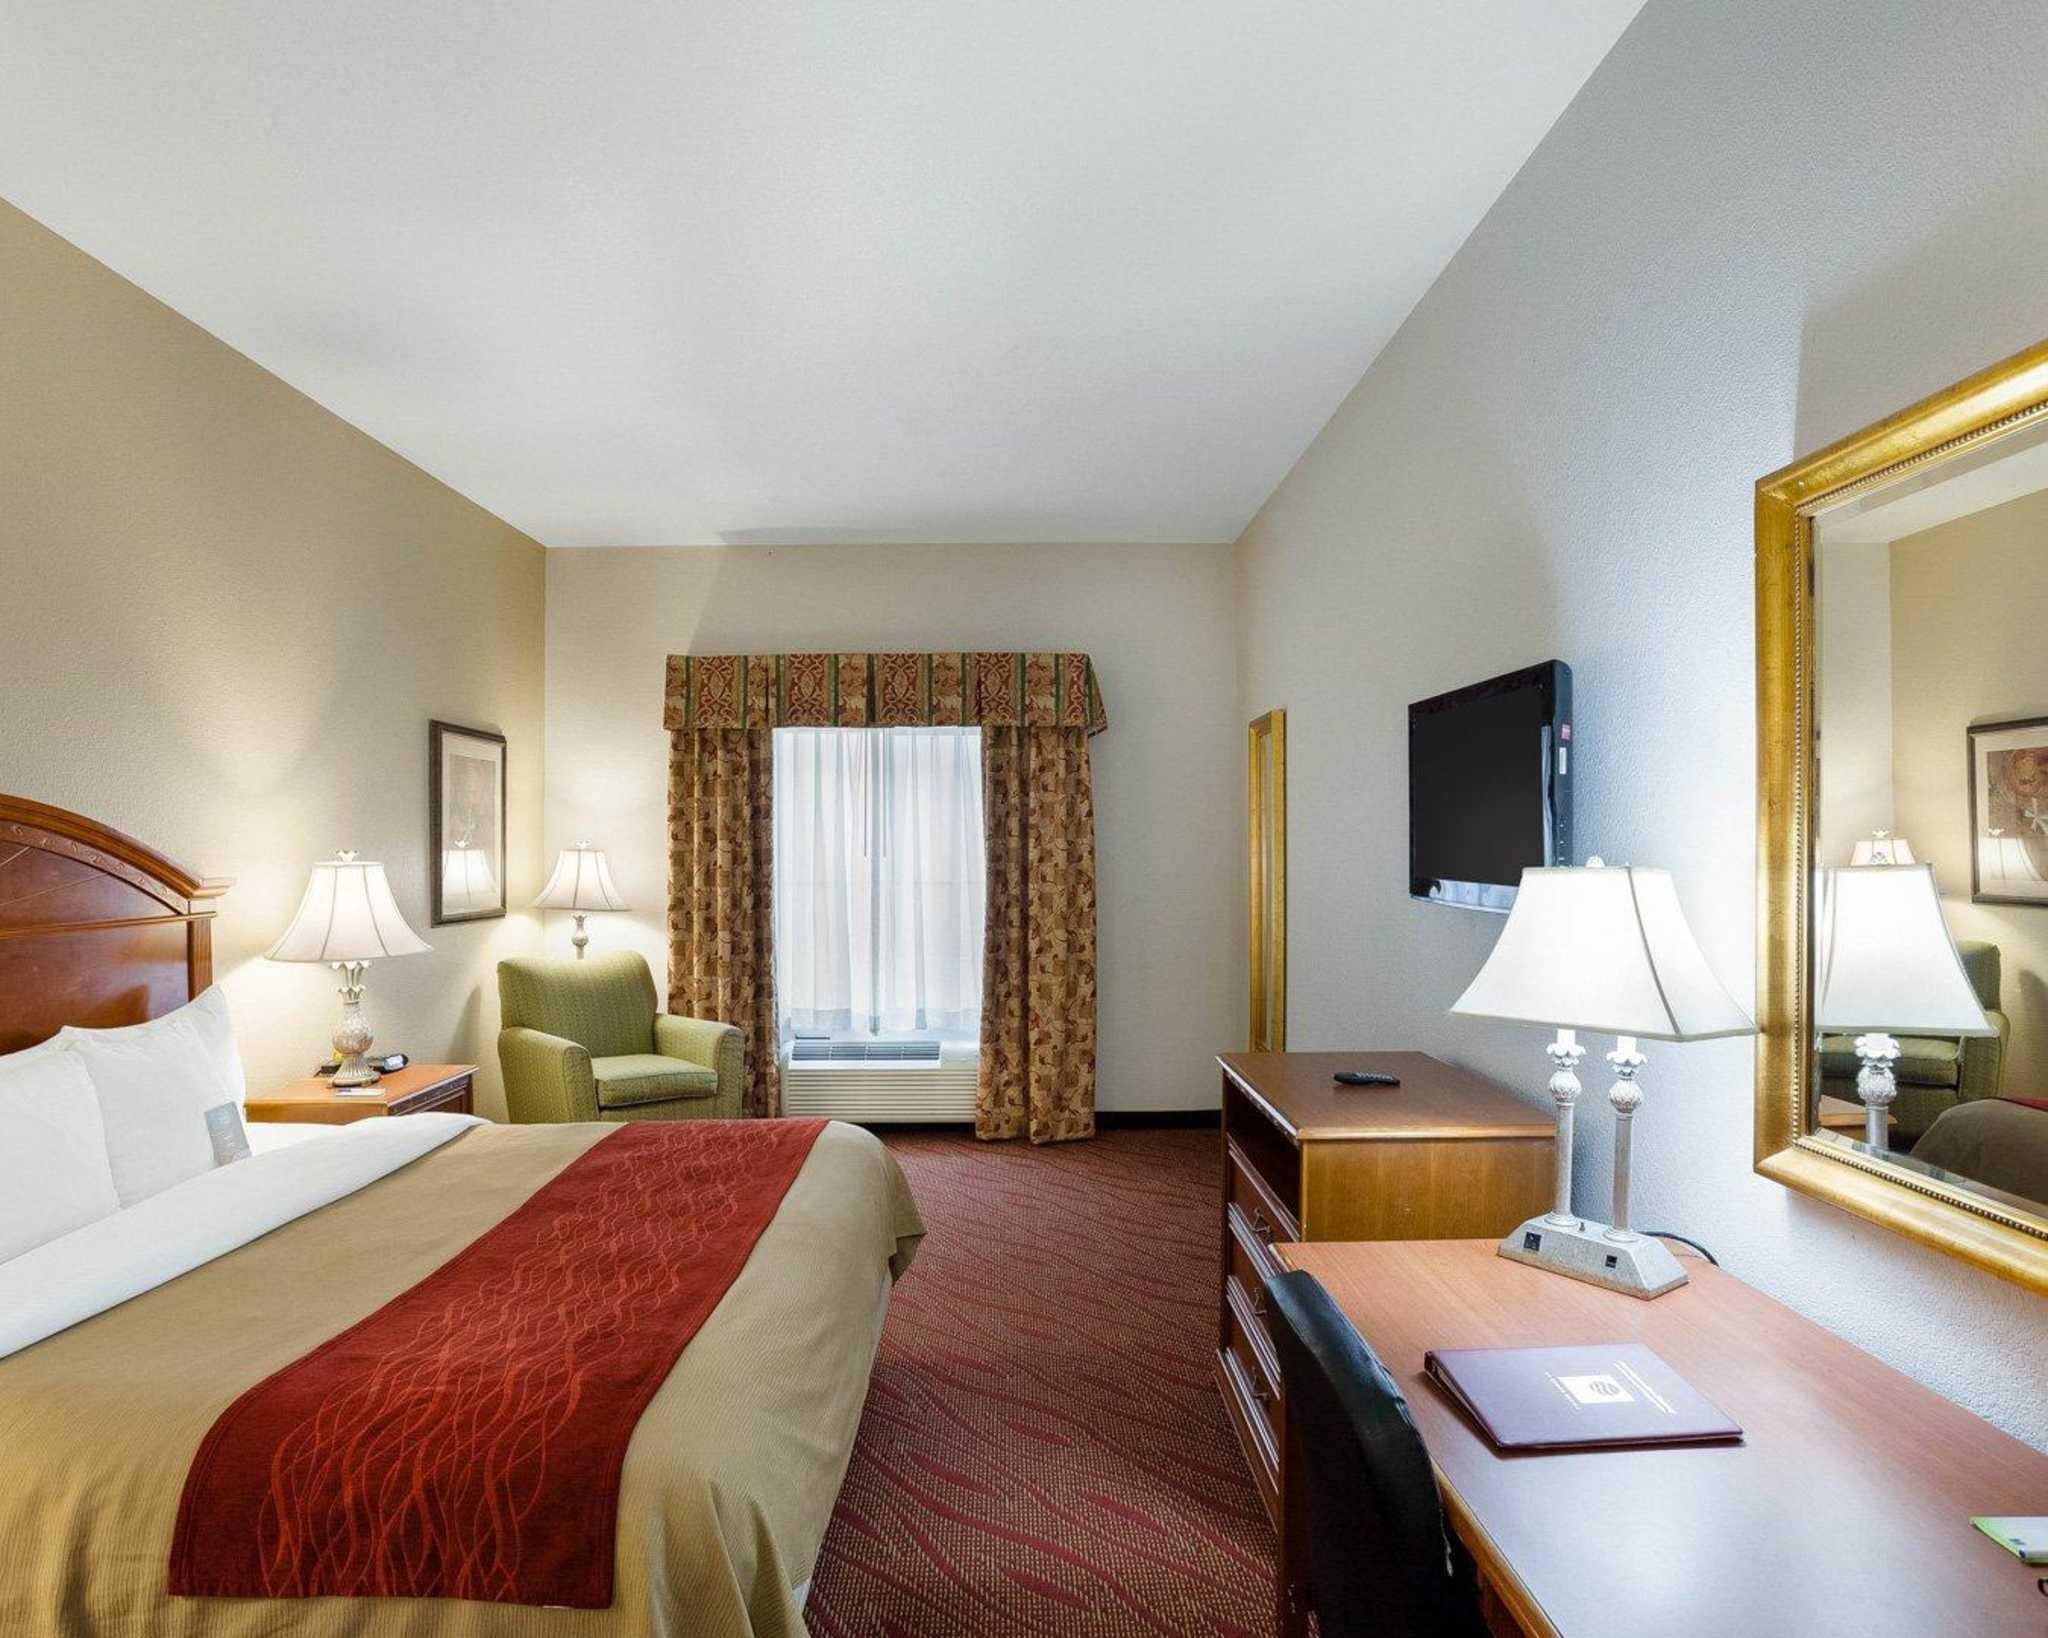 Comfort Inn & Suites Near Medical Center image 25